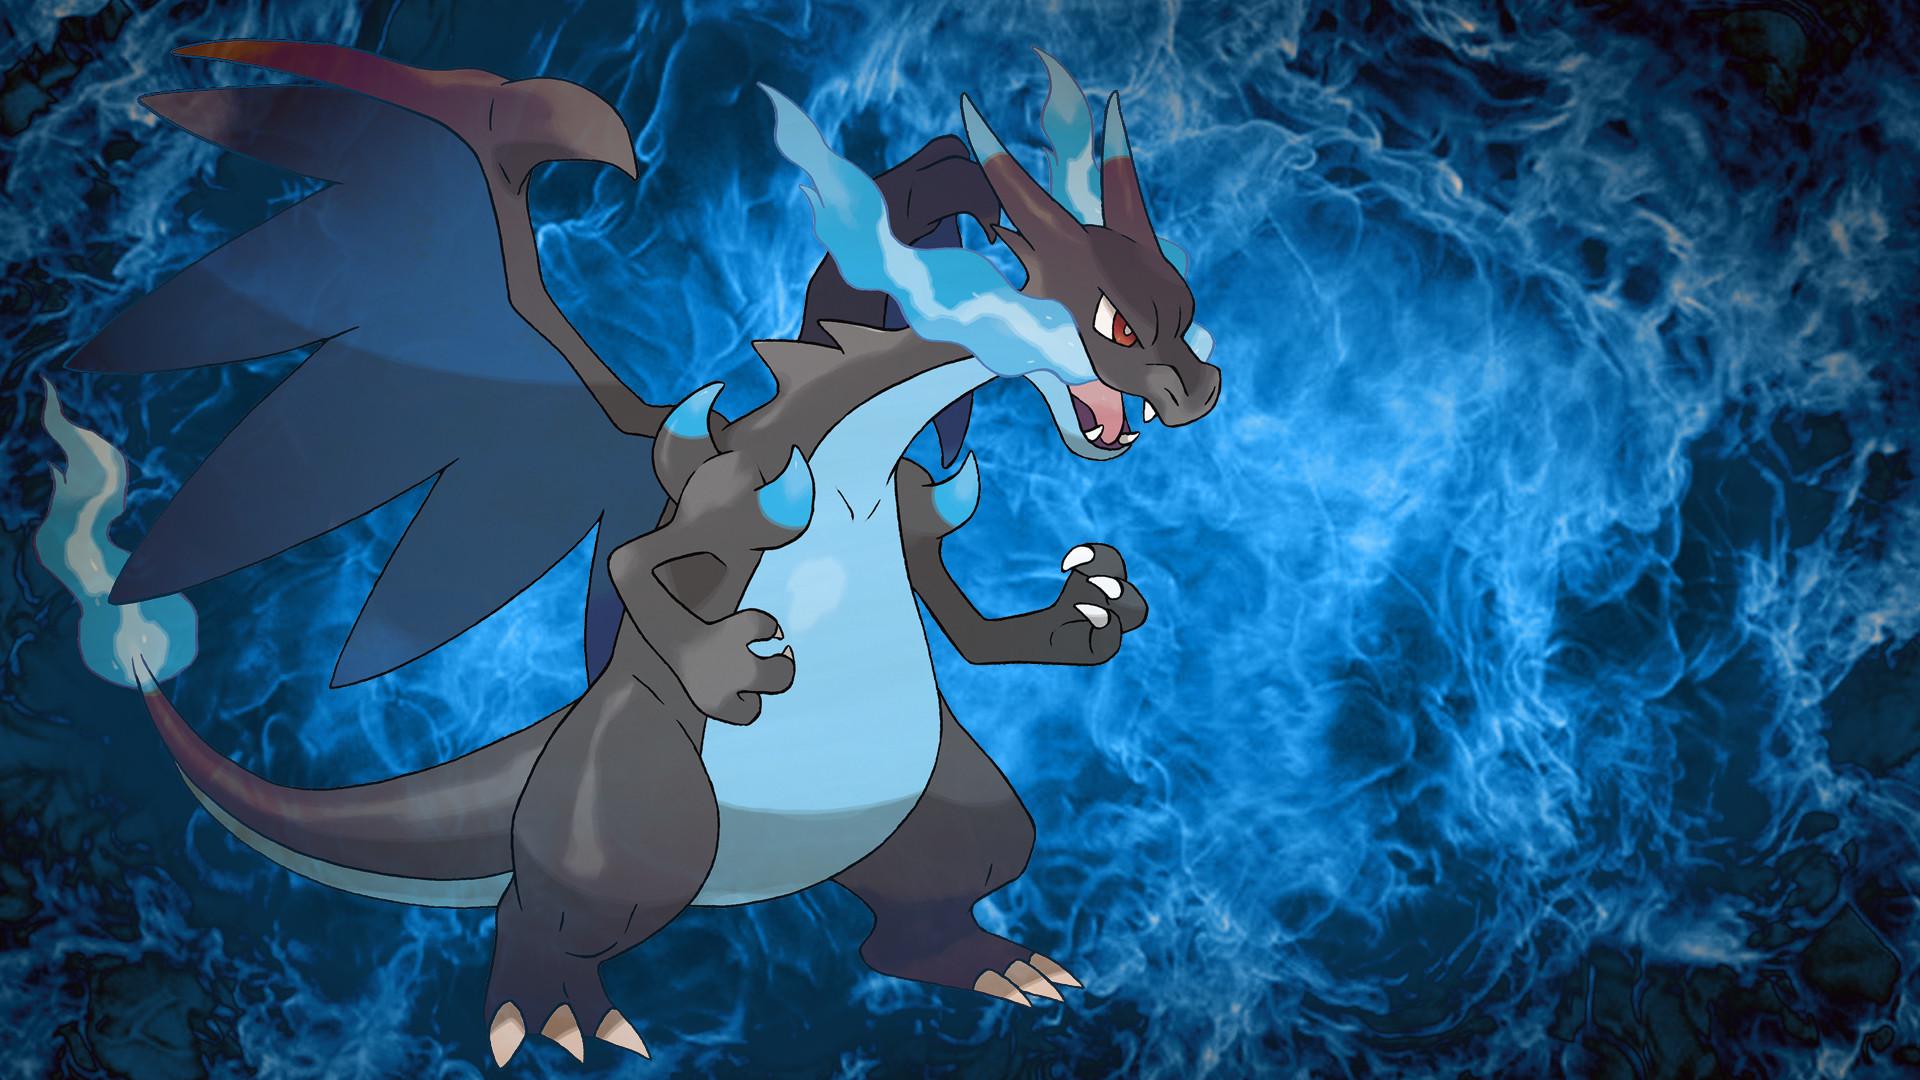 Res: 1920x1080, Download Pokemon Charizard Background Free.